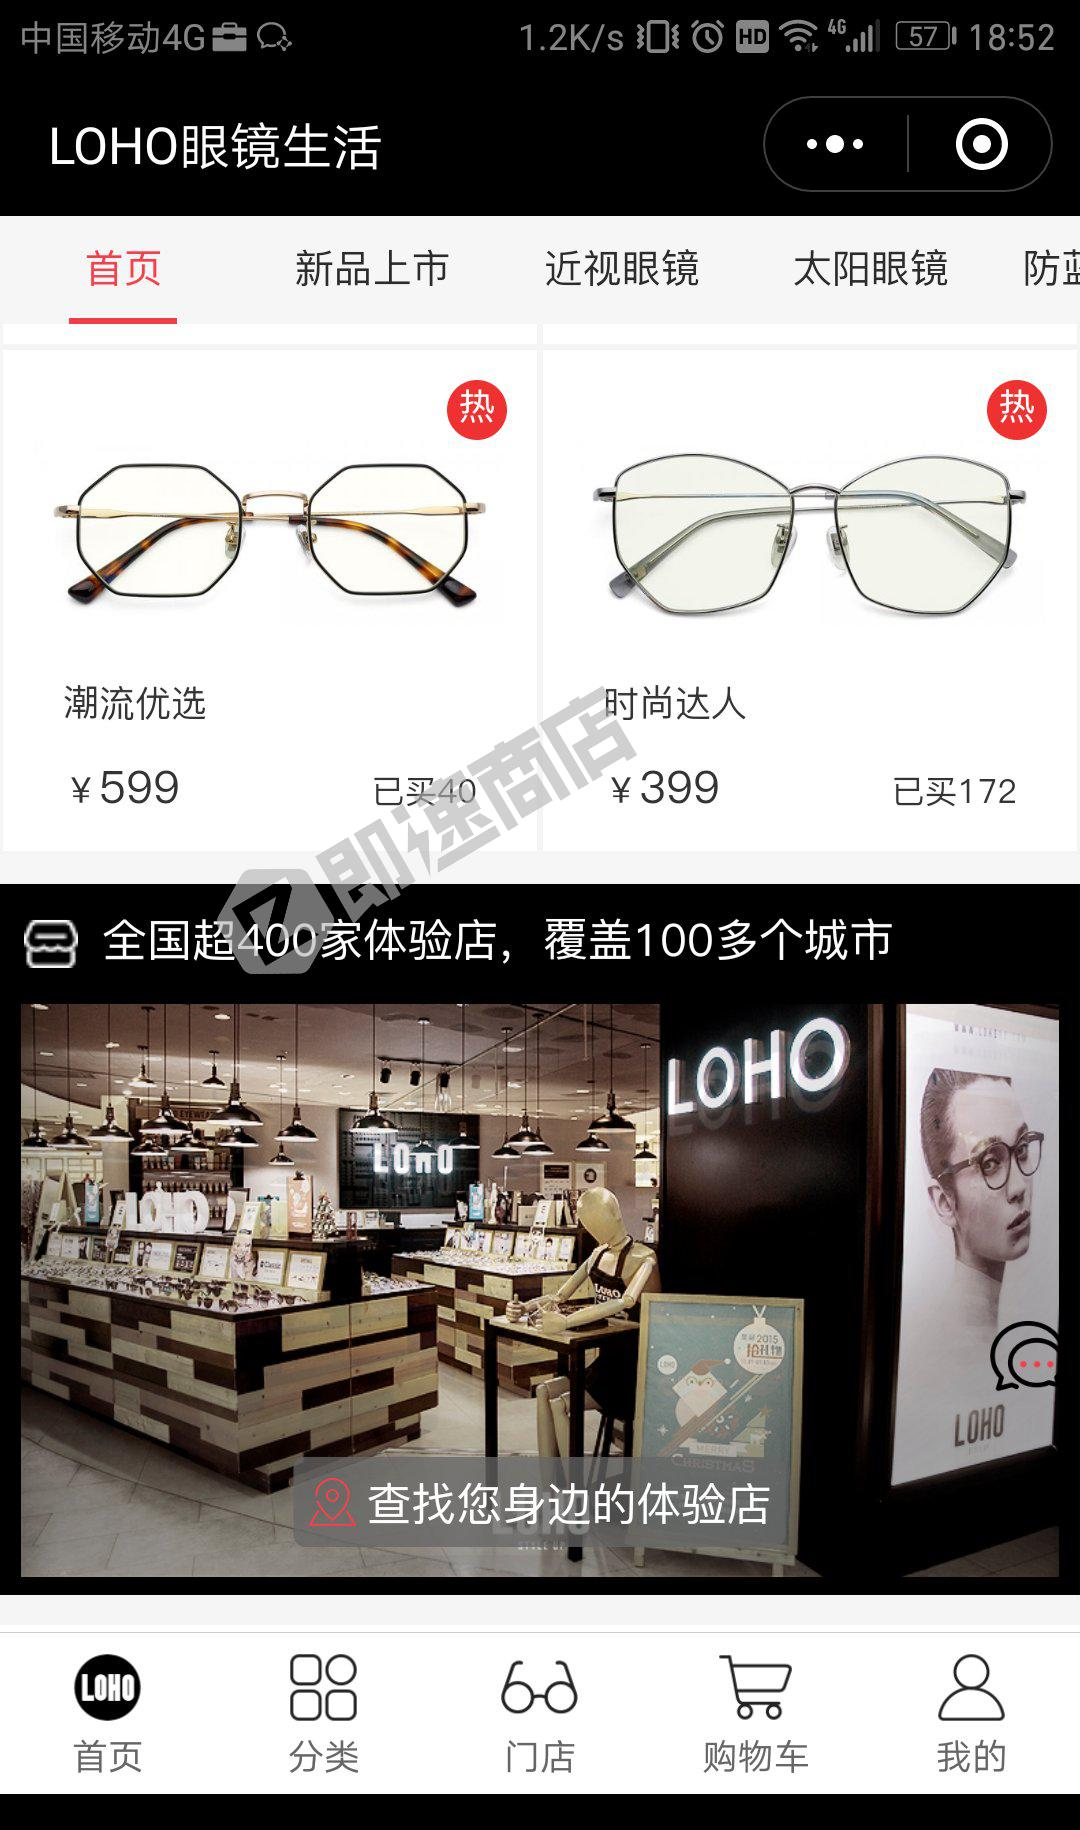 LOHO眼镜生活旗舰店小程序详情页截图